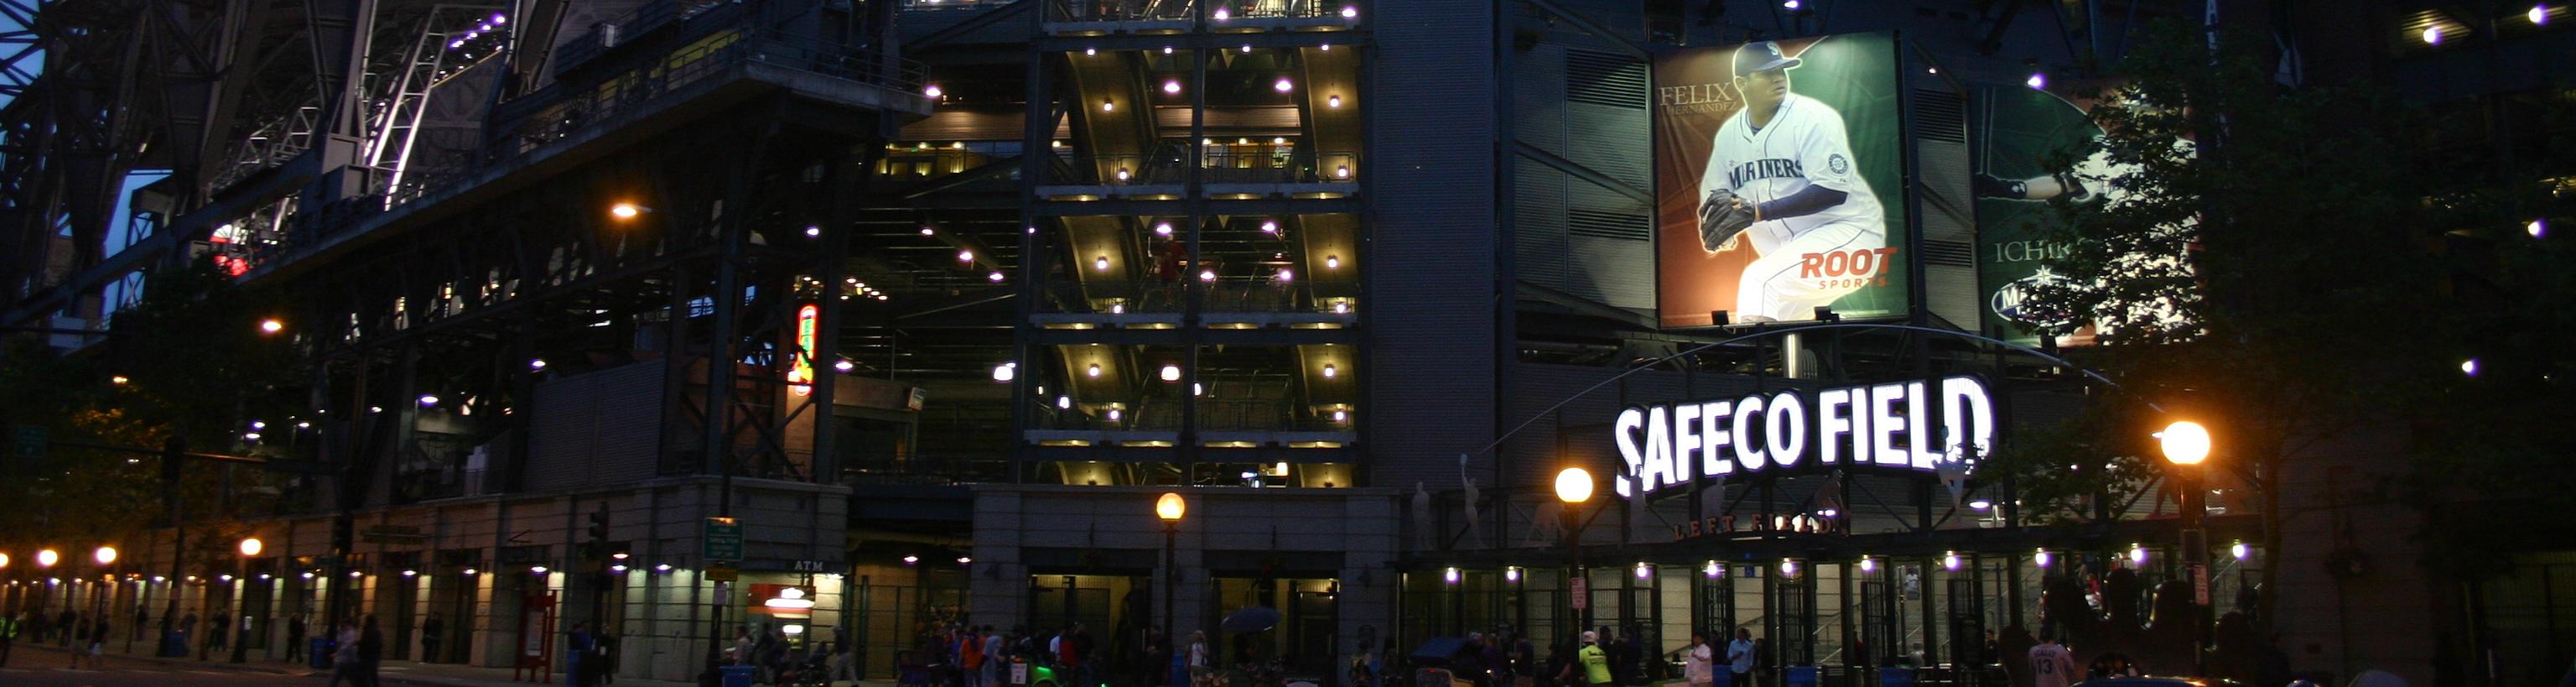 Safeco Field,Seattle trips,baseball tours,west coast tours